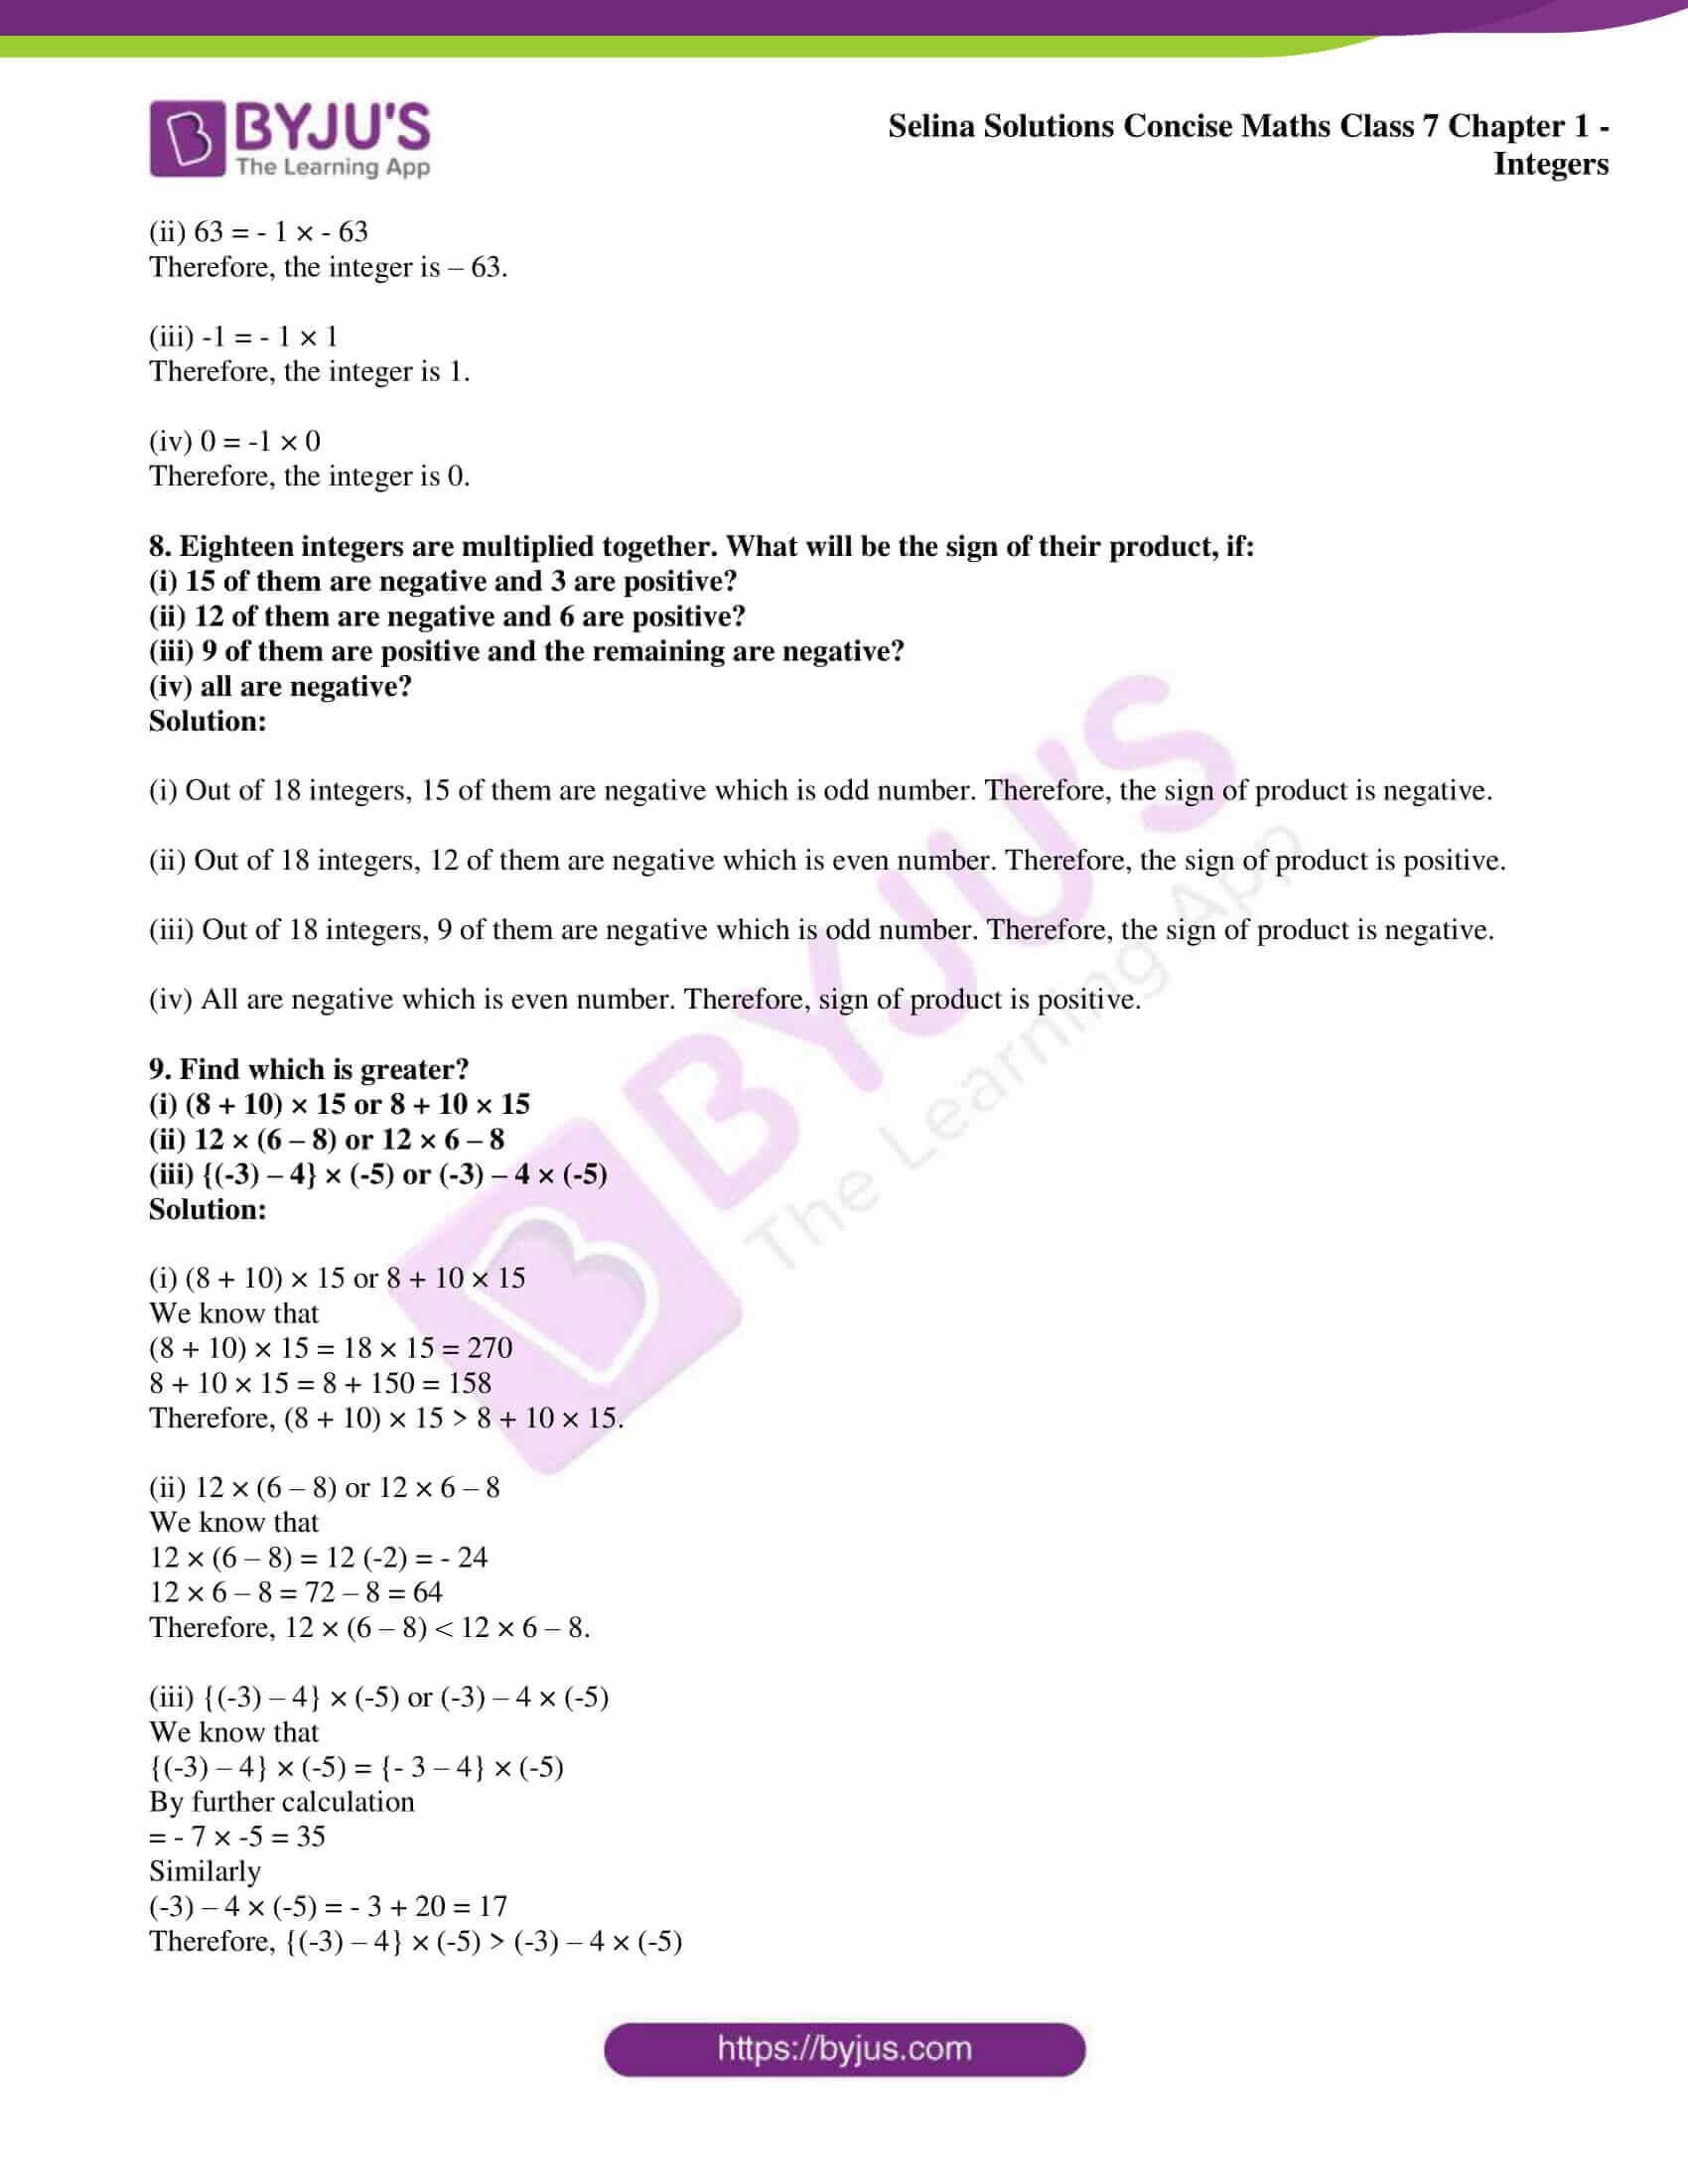 selina sol concise maths class 7 ch1 ex 1a 5